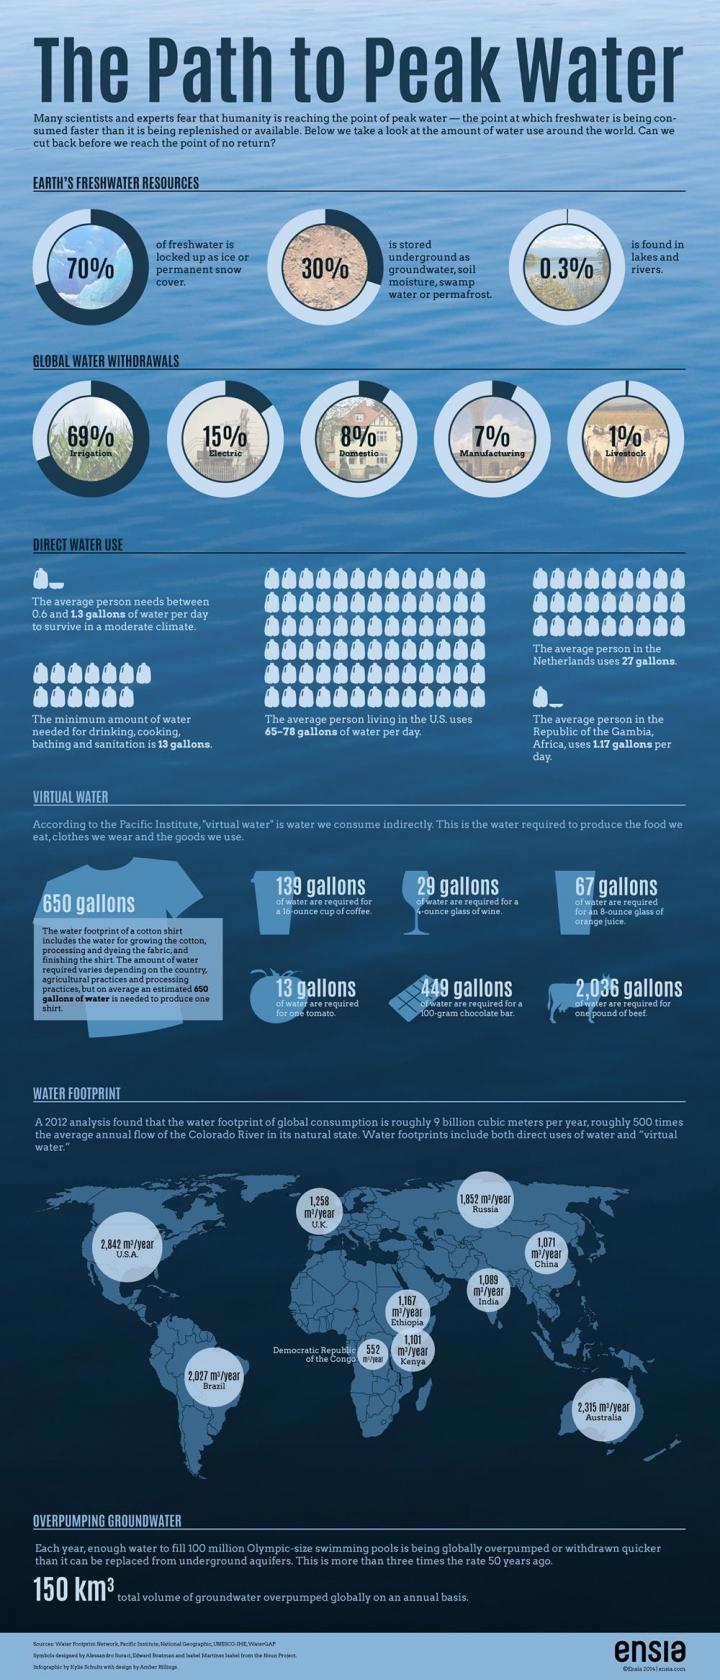 Ensia_infographic_peak_water